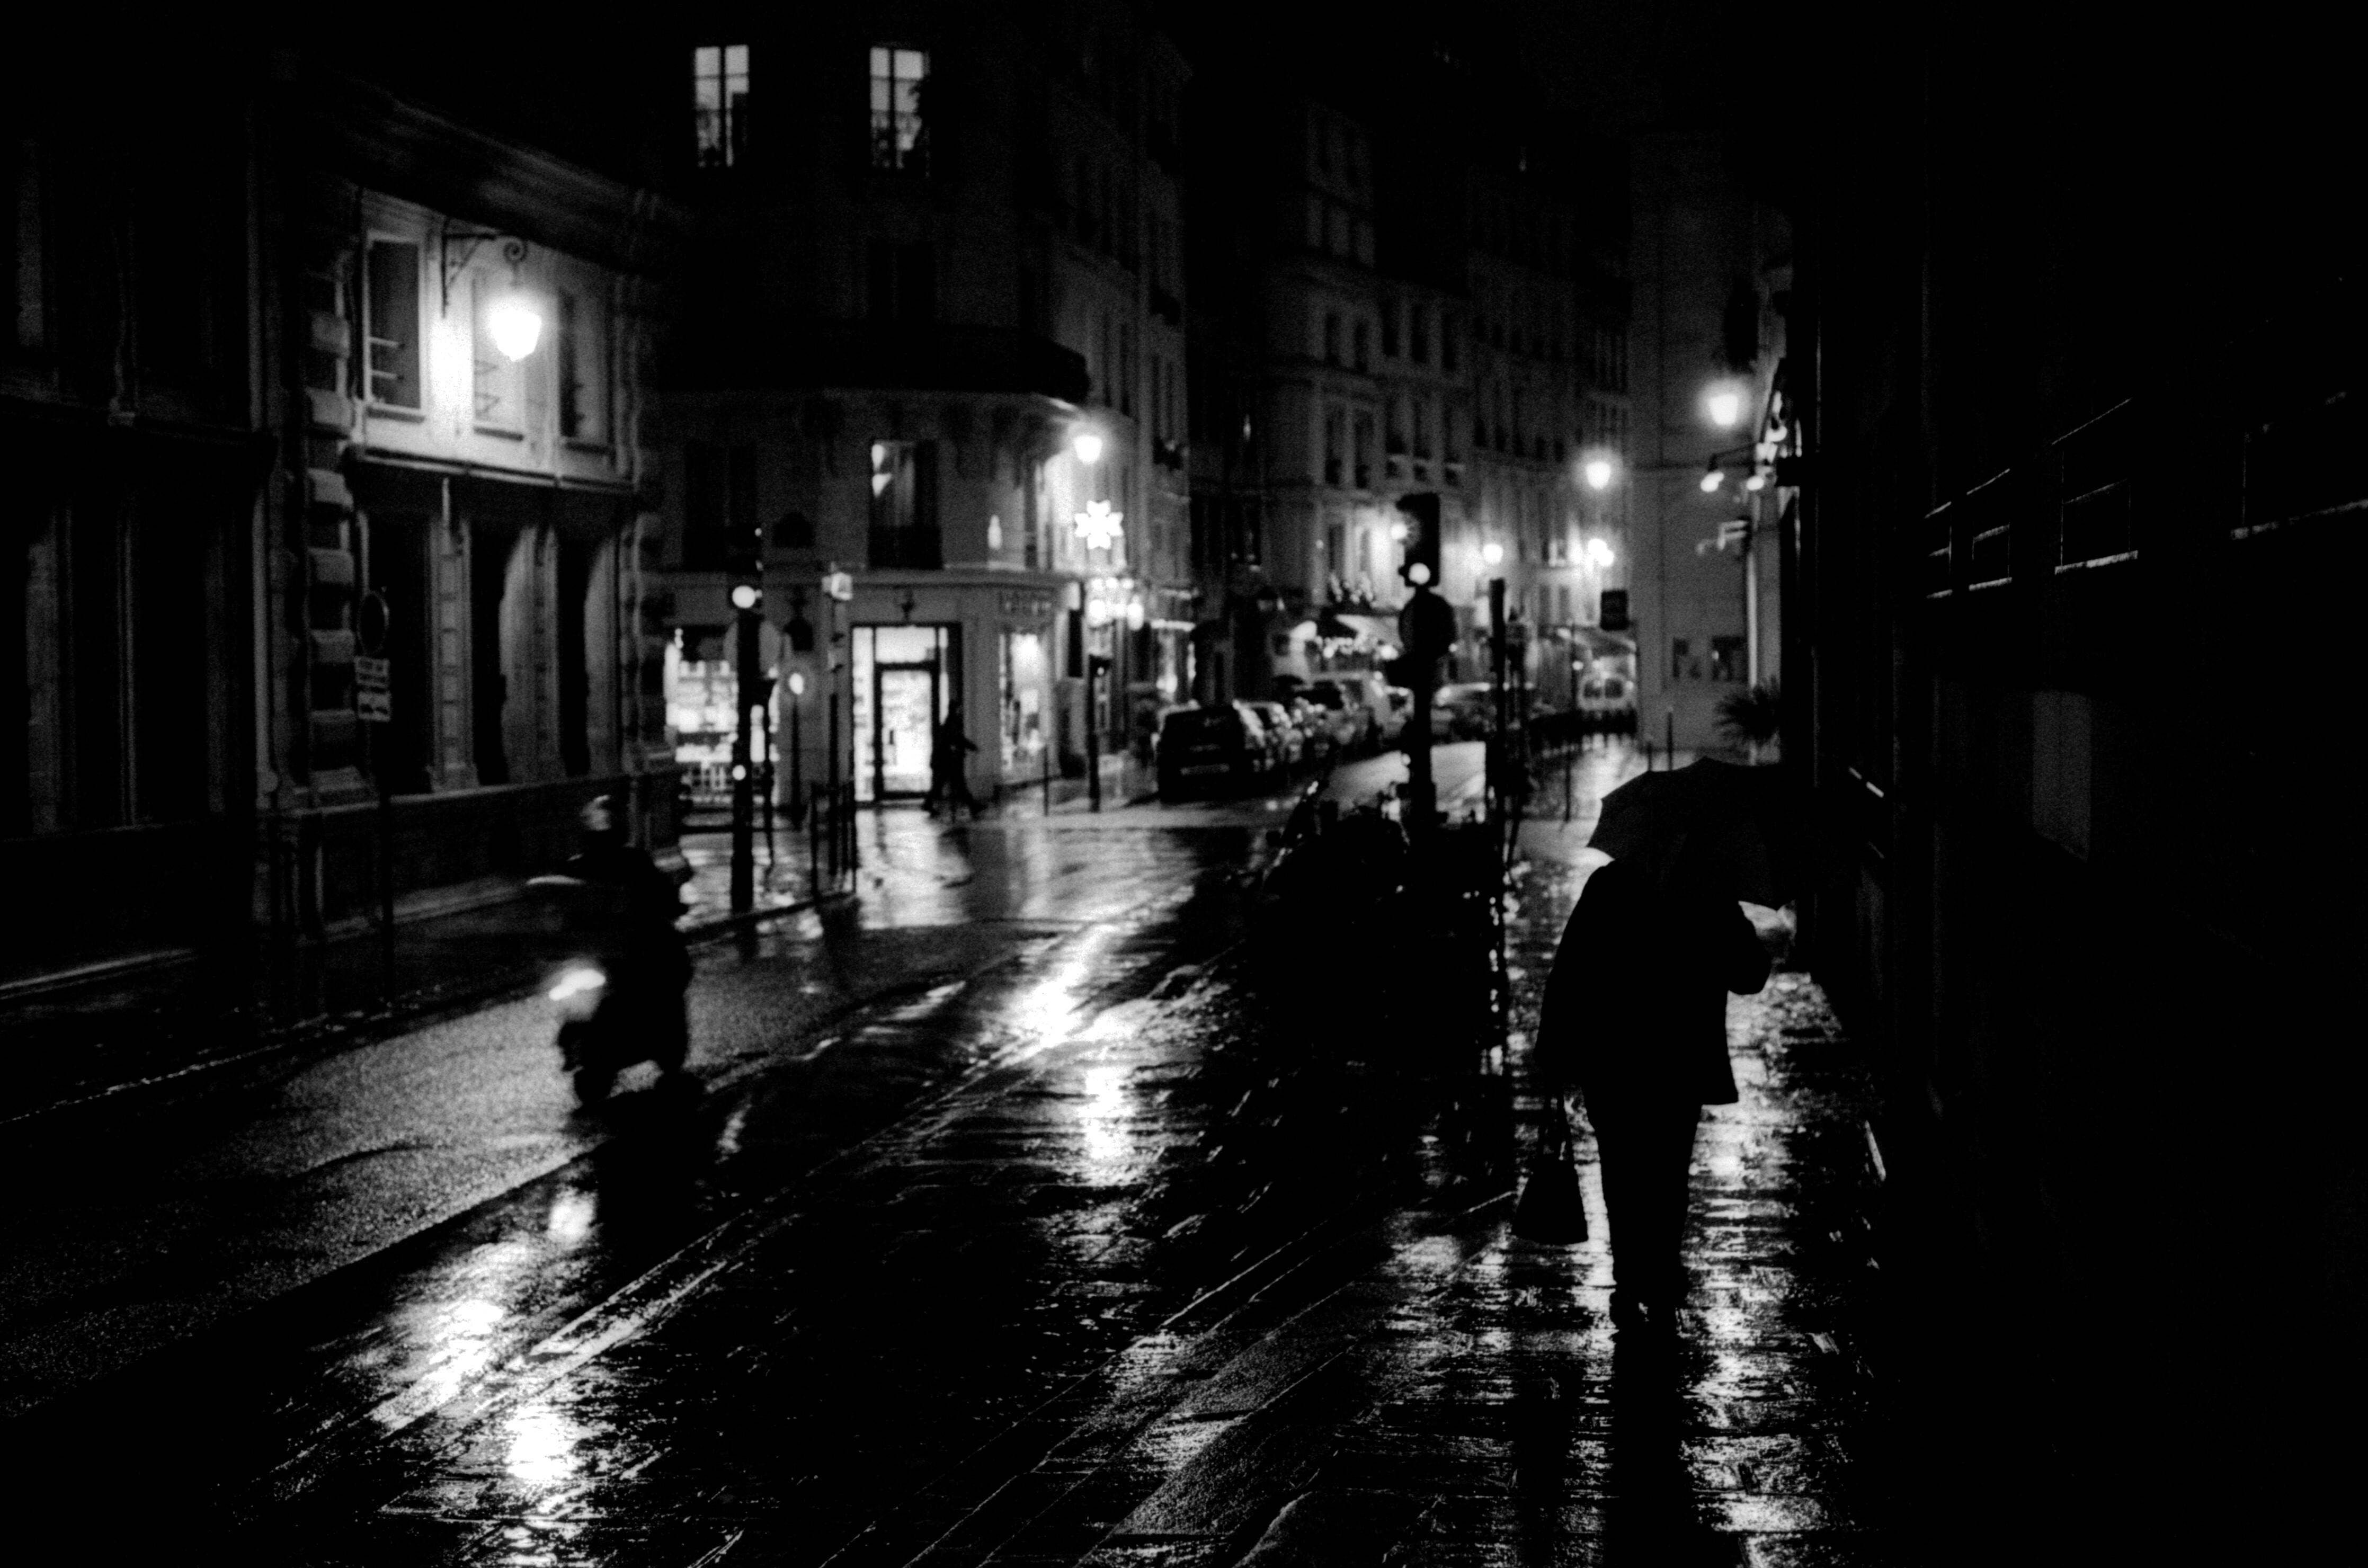 photo 4613036248 rain in paris. Black Bedroom Furniture Sets. Home Design Ideas